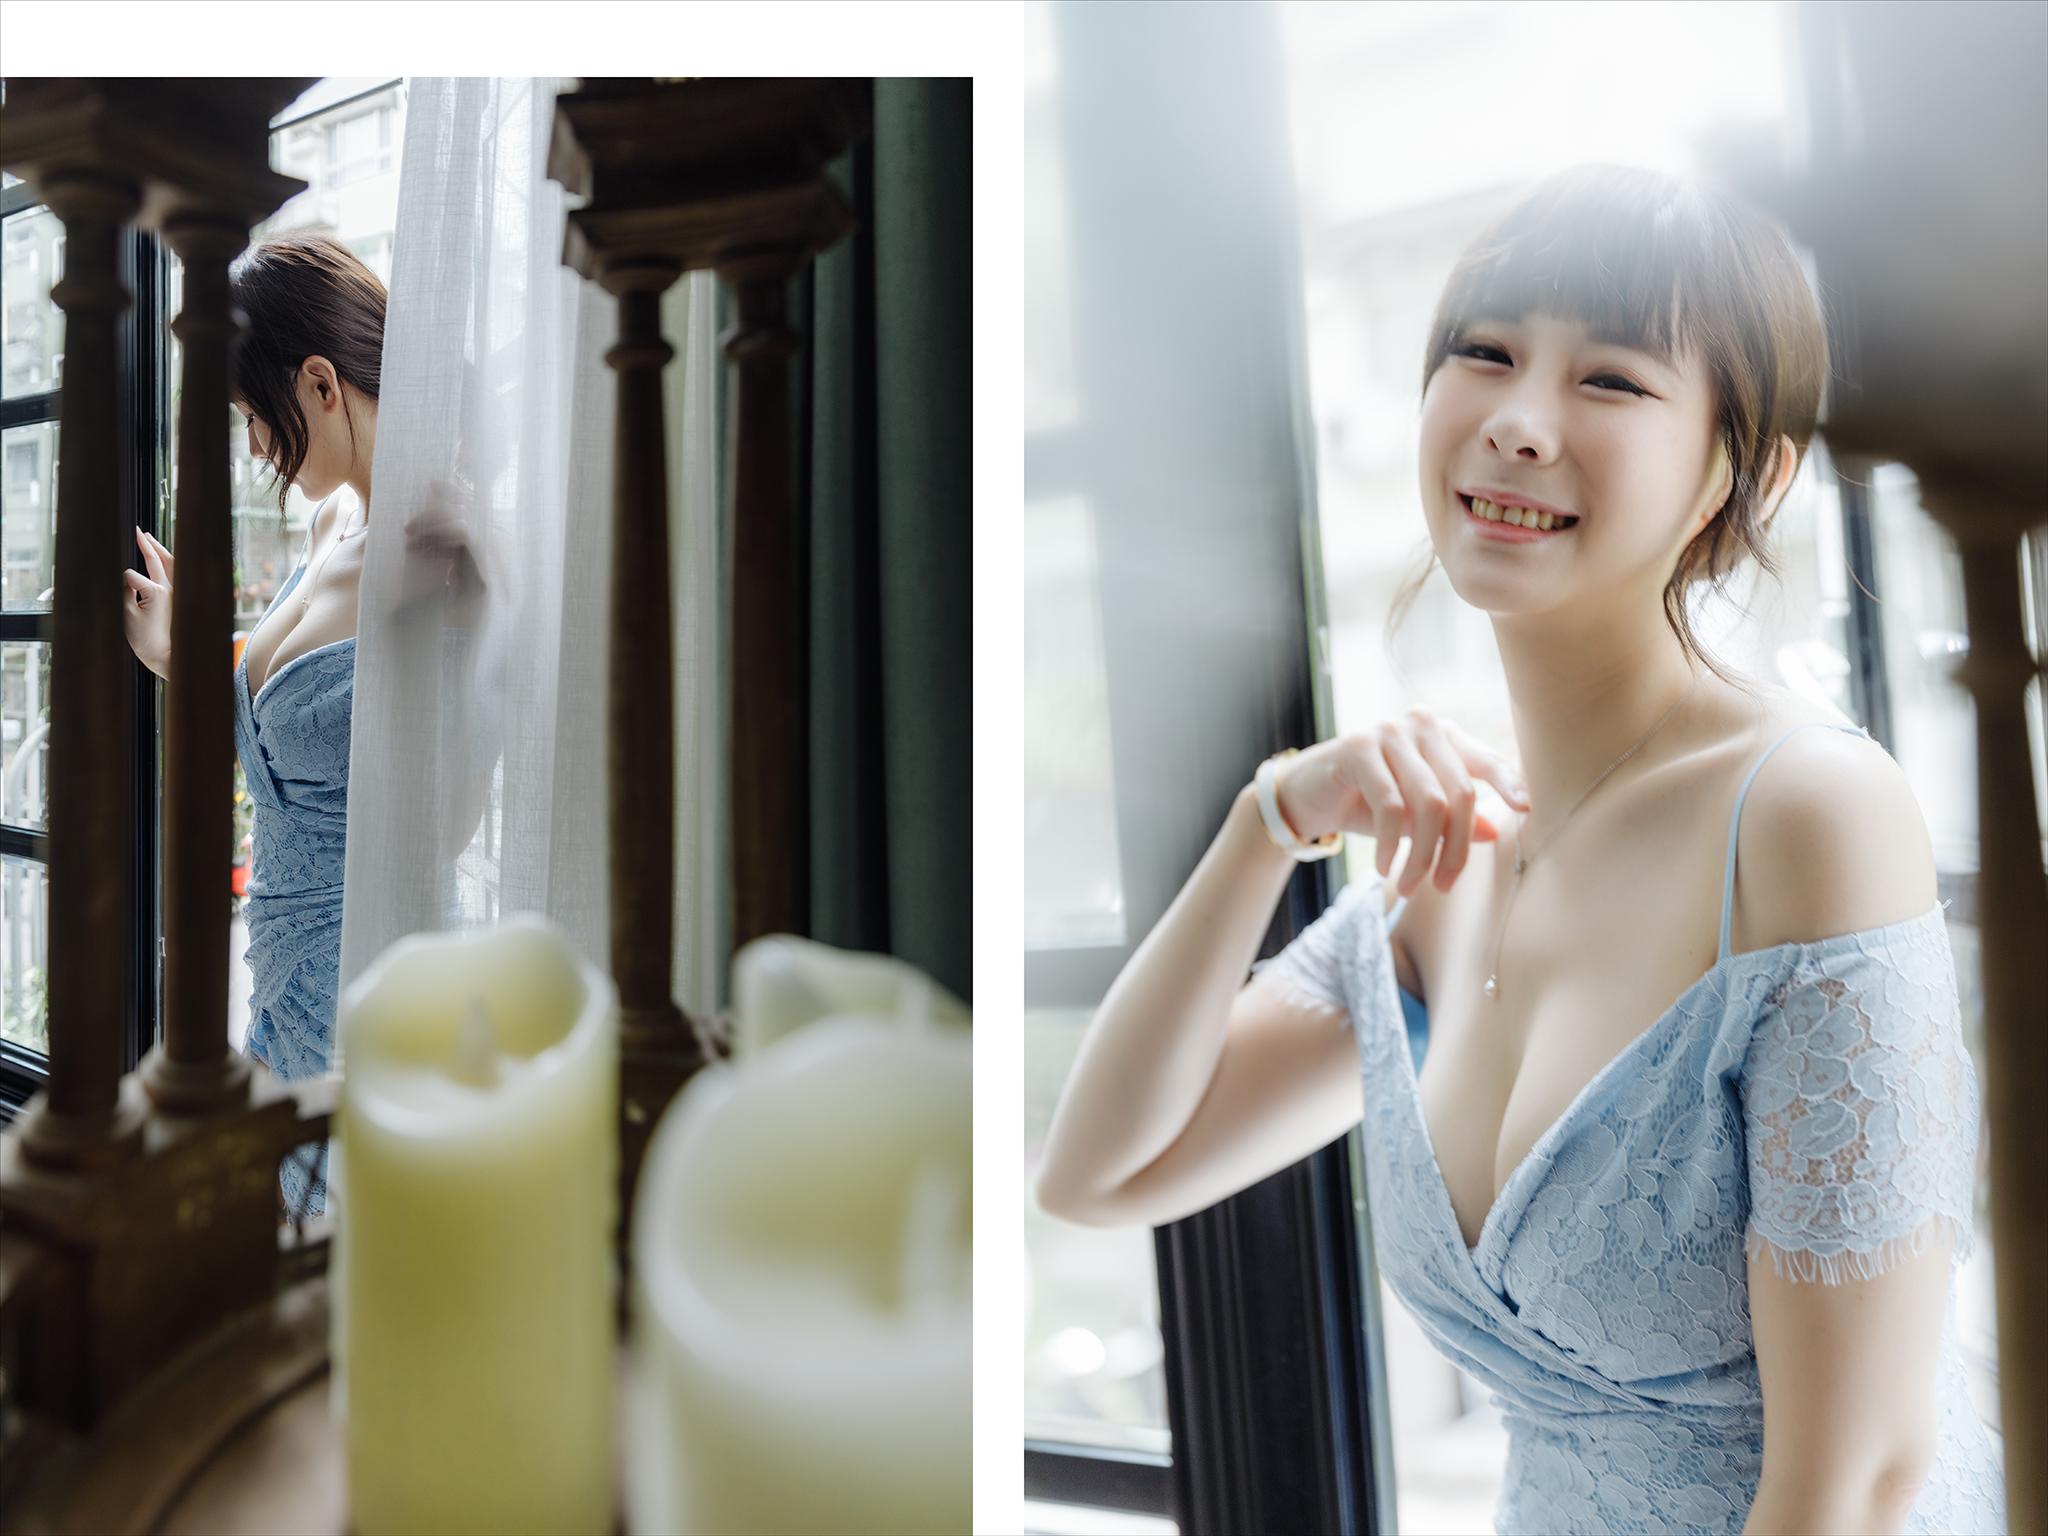 50180239207 9cbcae0e8a o - 【寫真】+潤潤+